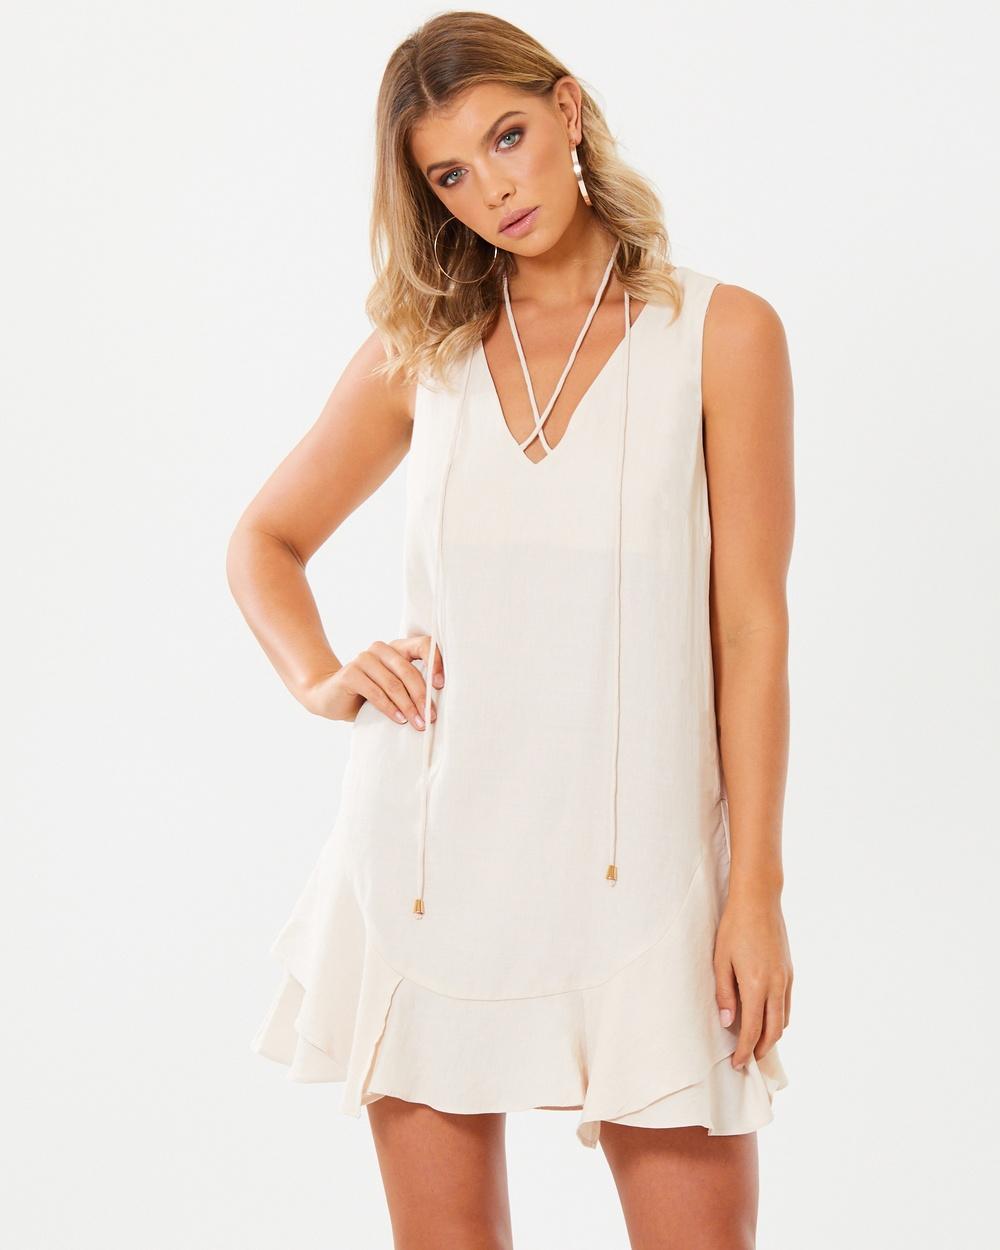 Buy Tussah Sand Carina Tie-Neck Dress -  shop Tussah dresses online